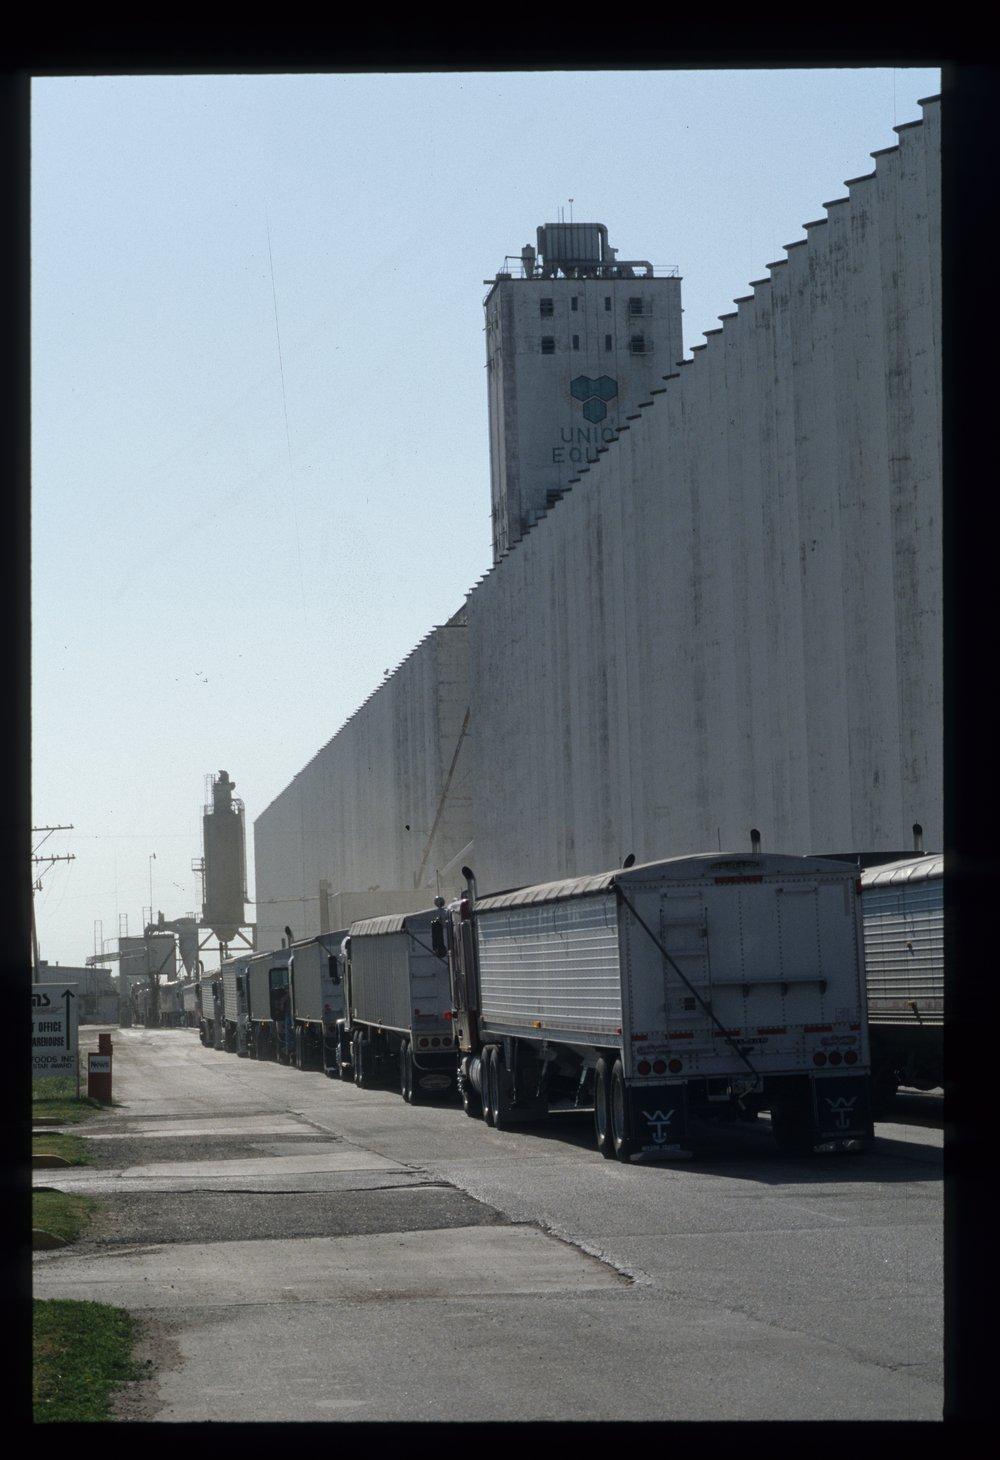 Hutchinson grain elevator, Hutchinson, Kansas - 3